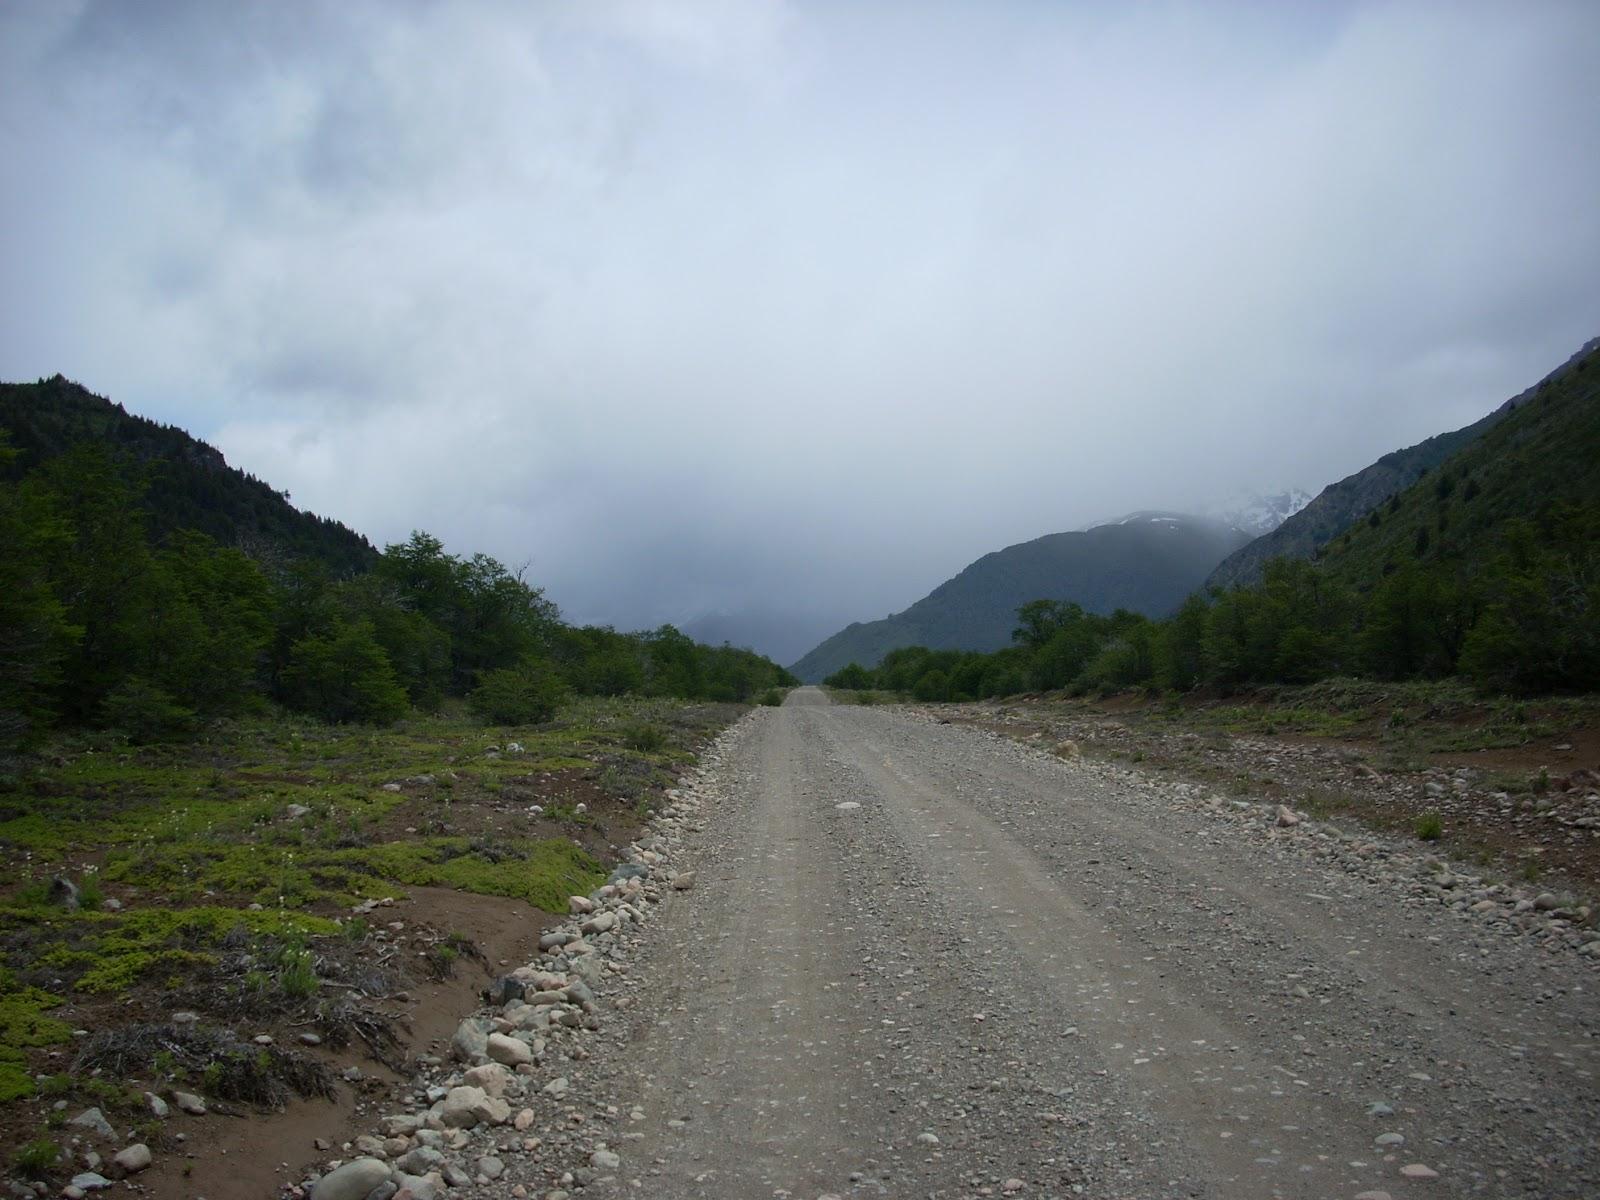 10km dirt road detour